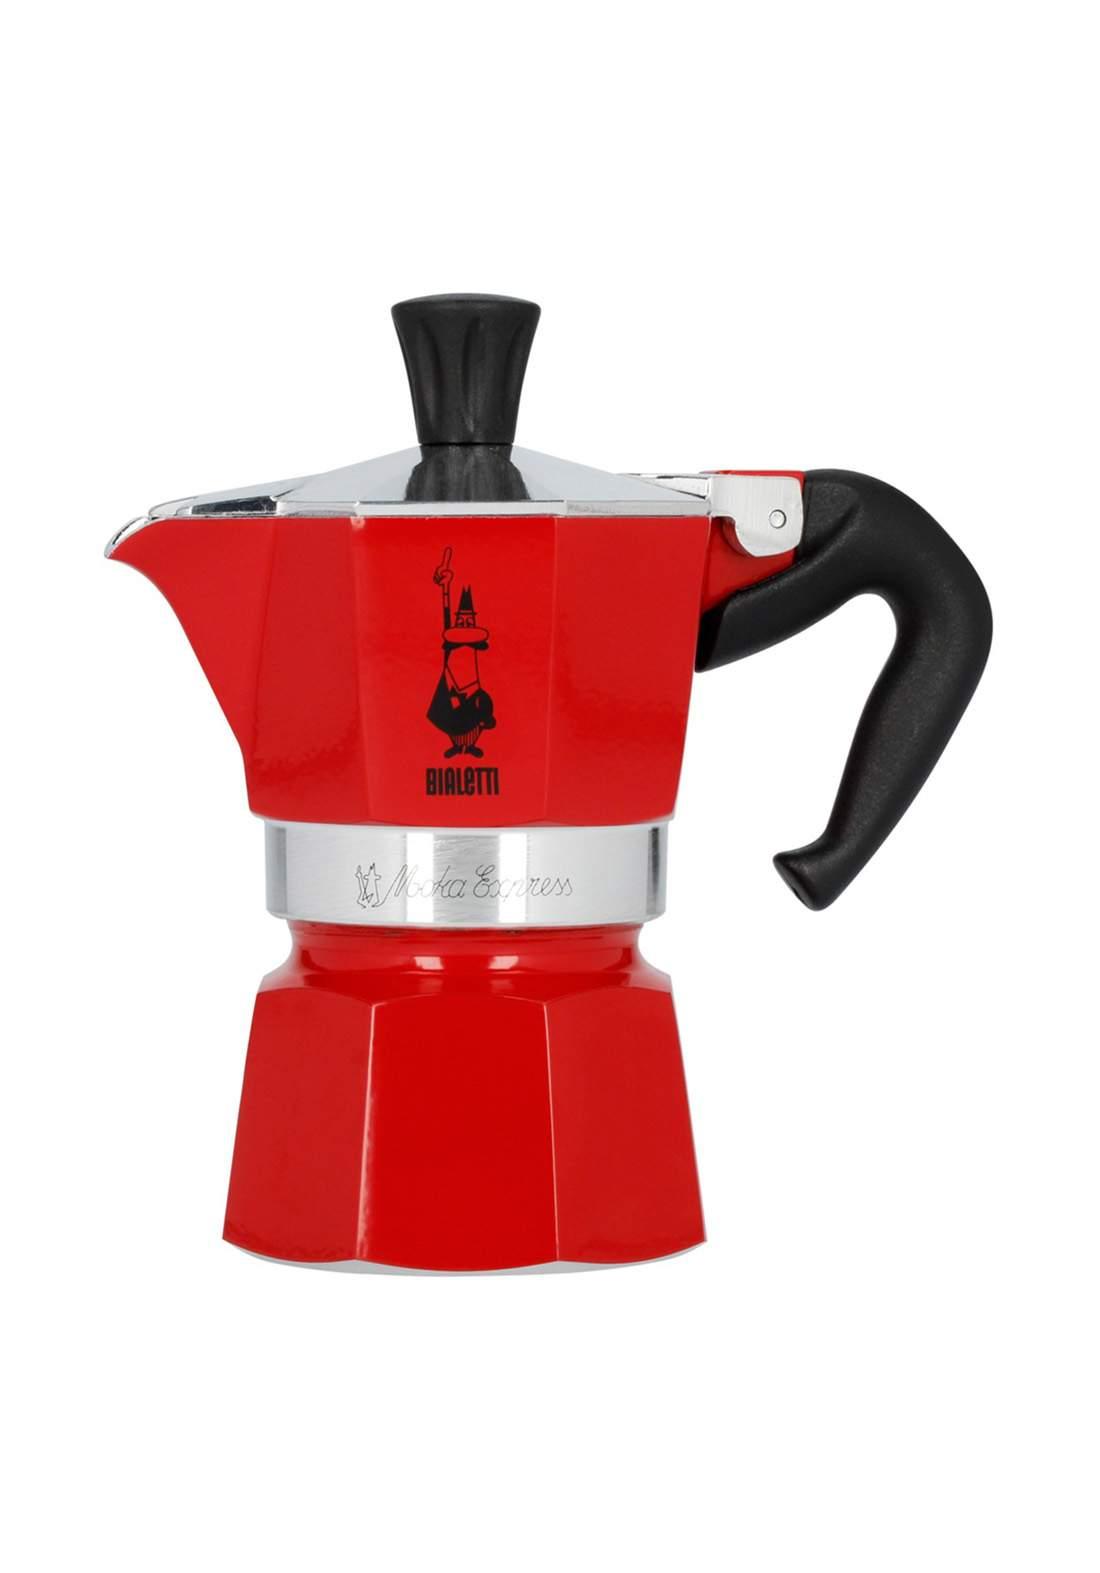 Bialetti Coffee Machine 130 ml ماكنة صنع قهوة